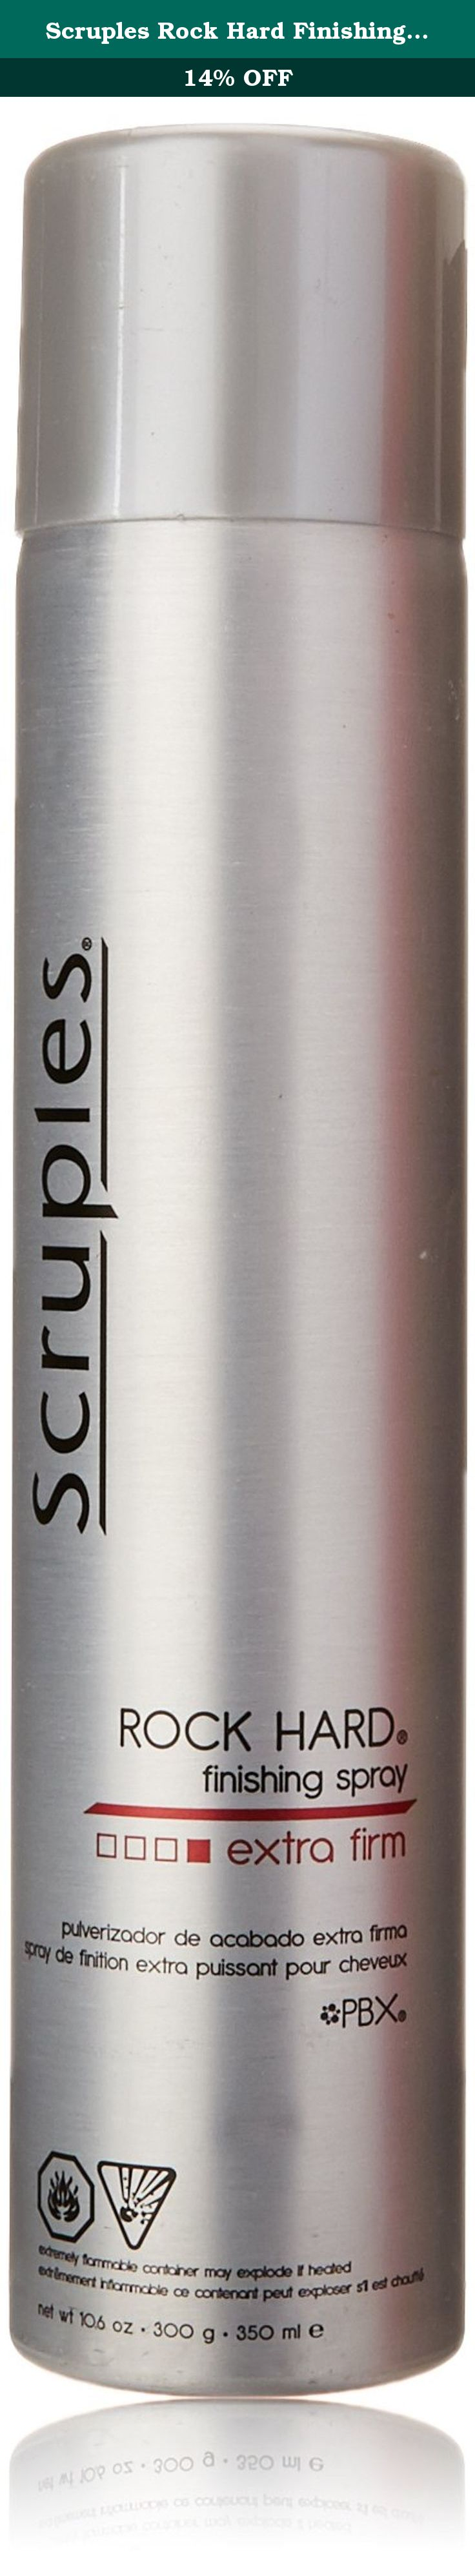 Scruples Rock Hard Finishing Spray, 10.6 Fluid Ounce. This